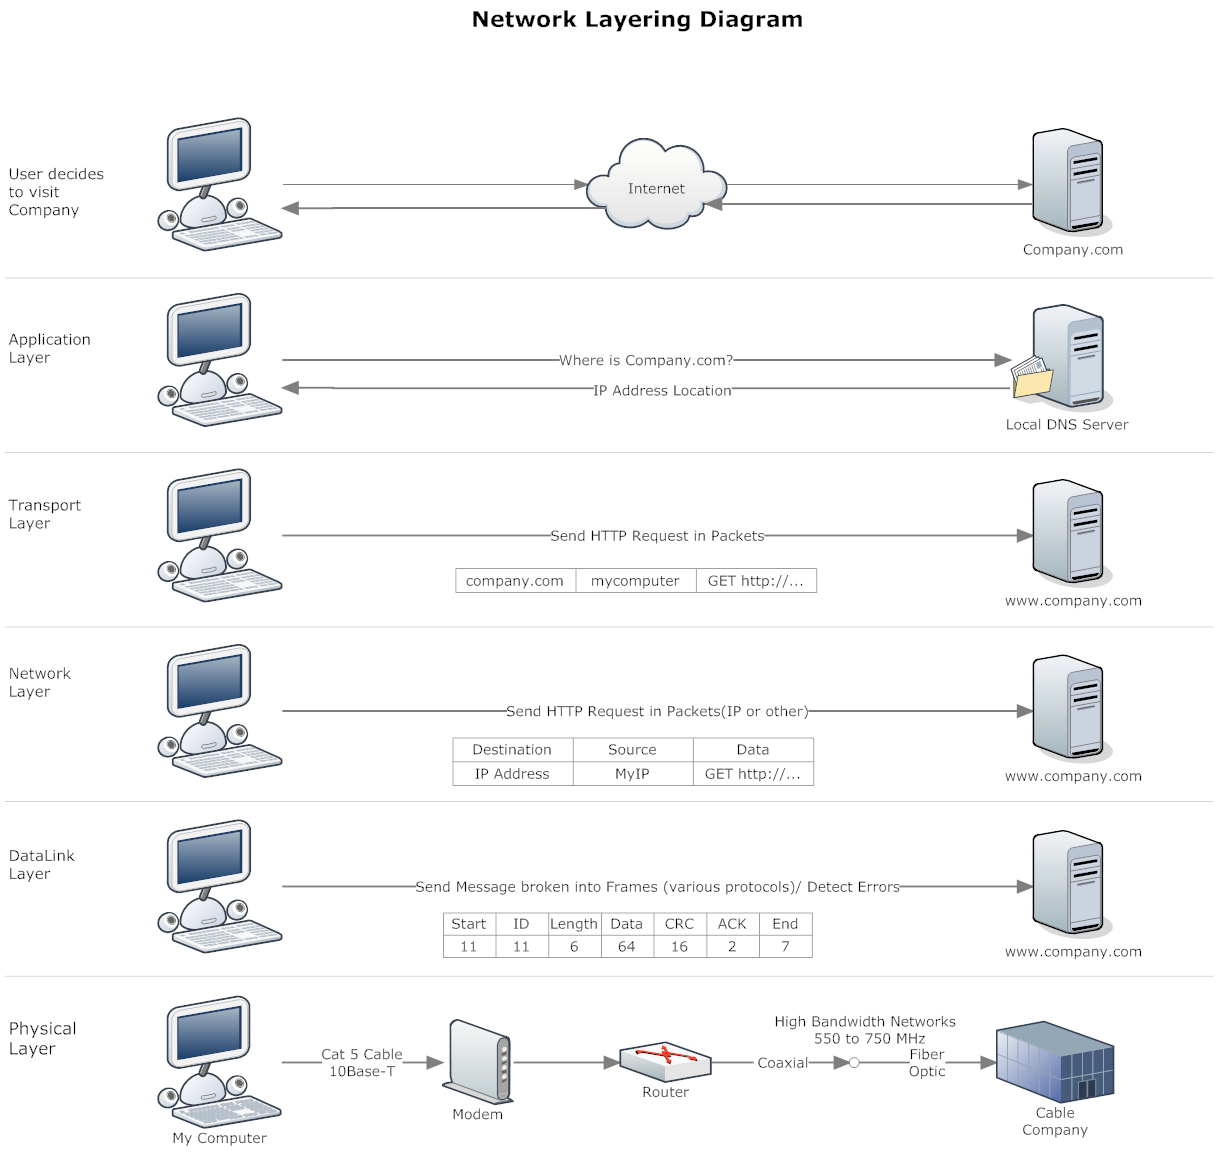 medium resolution of network diagram example network layering diagram computer network software development java layering